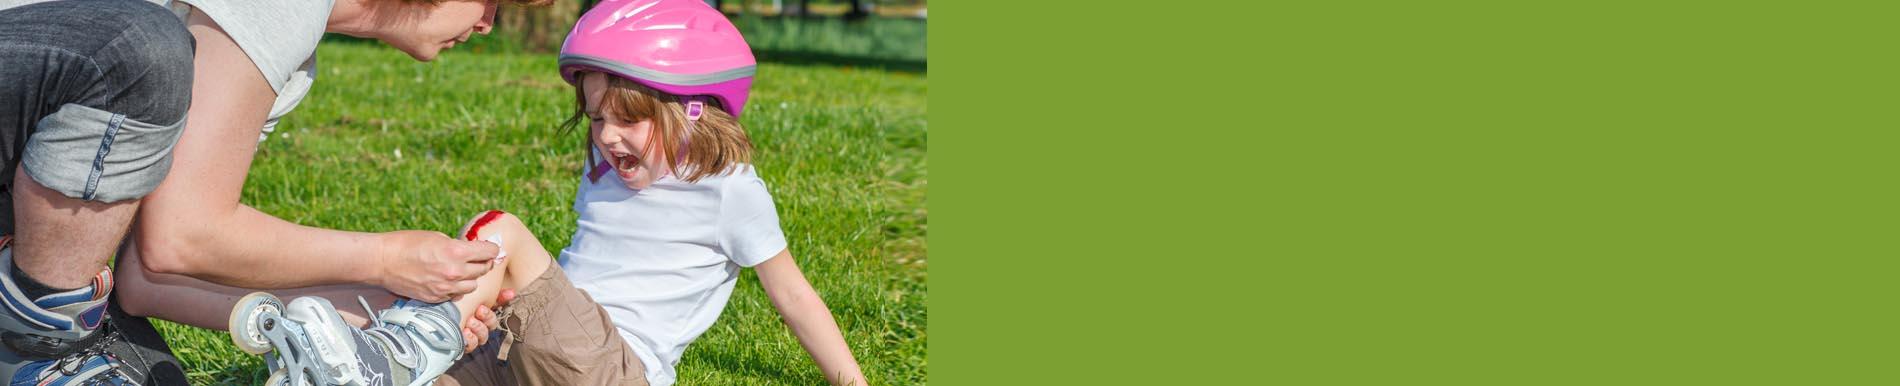 https://www.healthychildren.org/SiteCollectionImage-Homepage-Banners/cuts_scrapes_banner.jpg